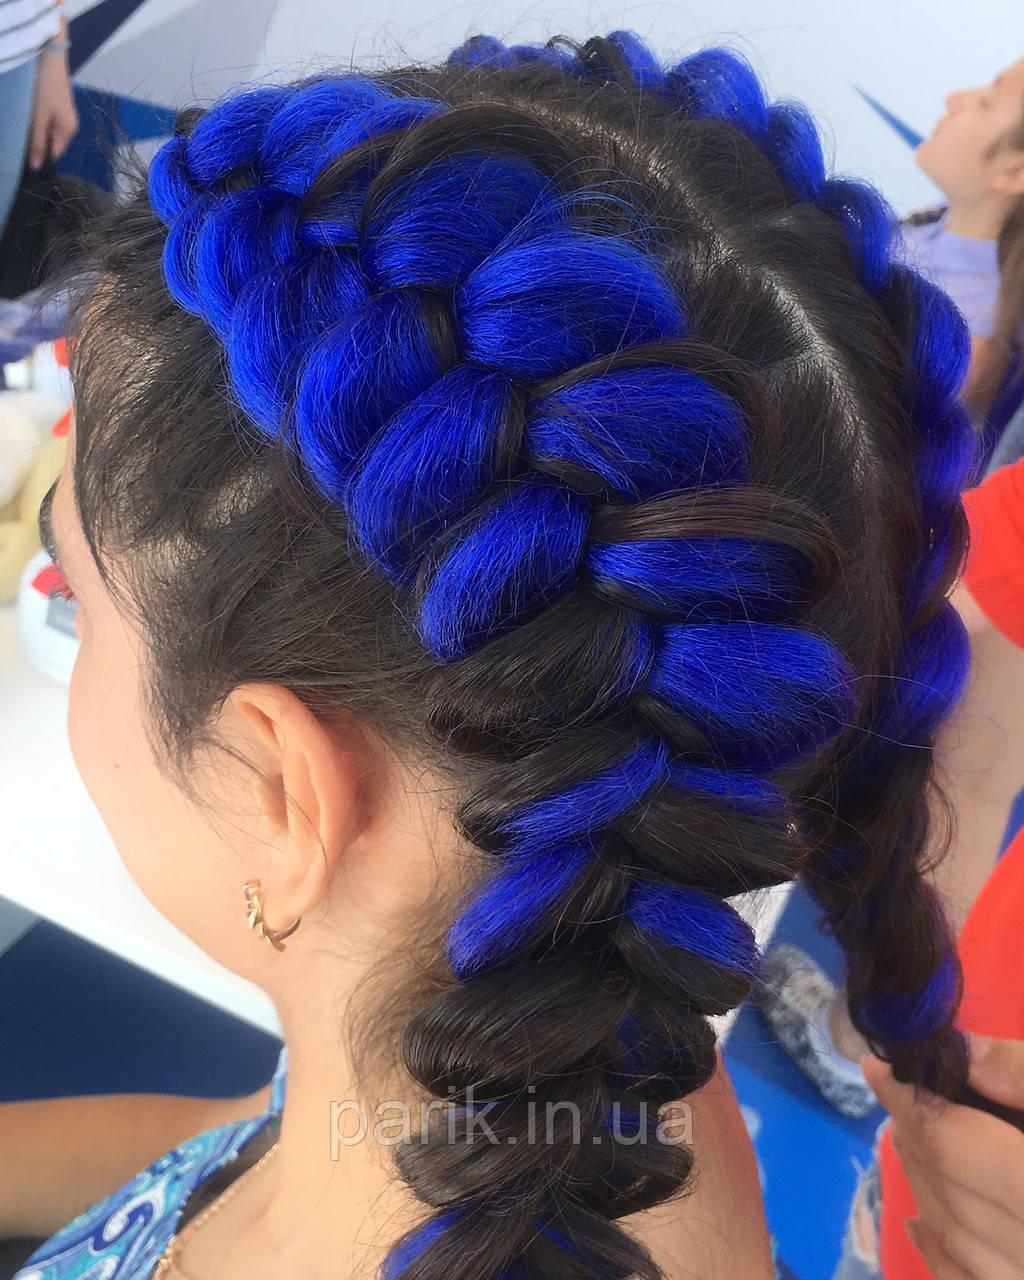 💙 Канекалон однотонный яркий синий, коса 💙